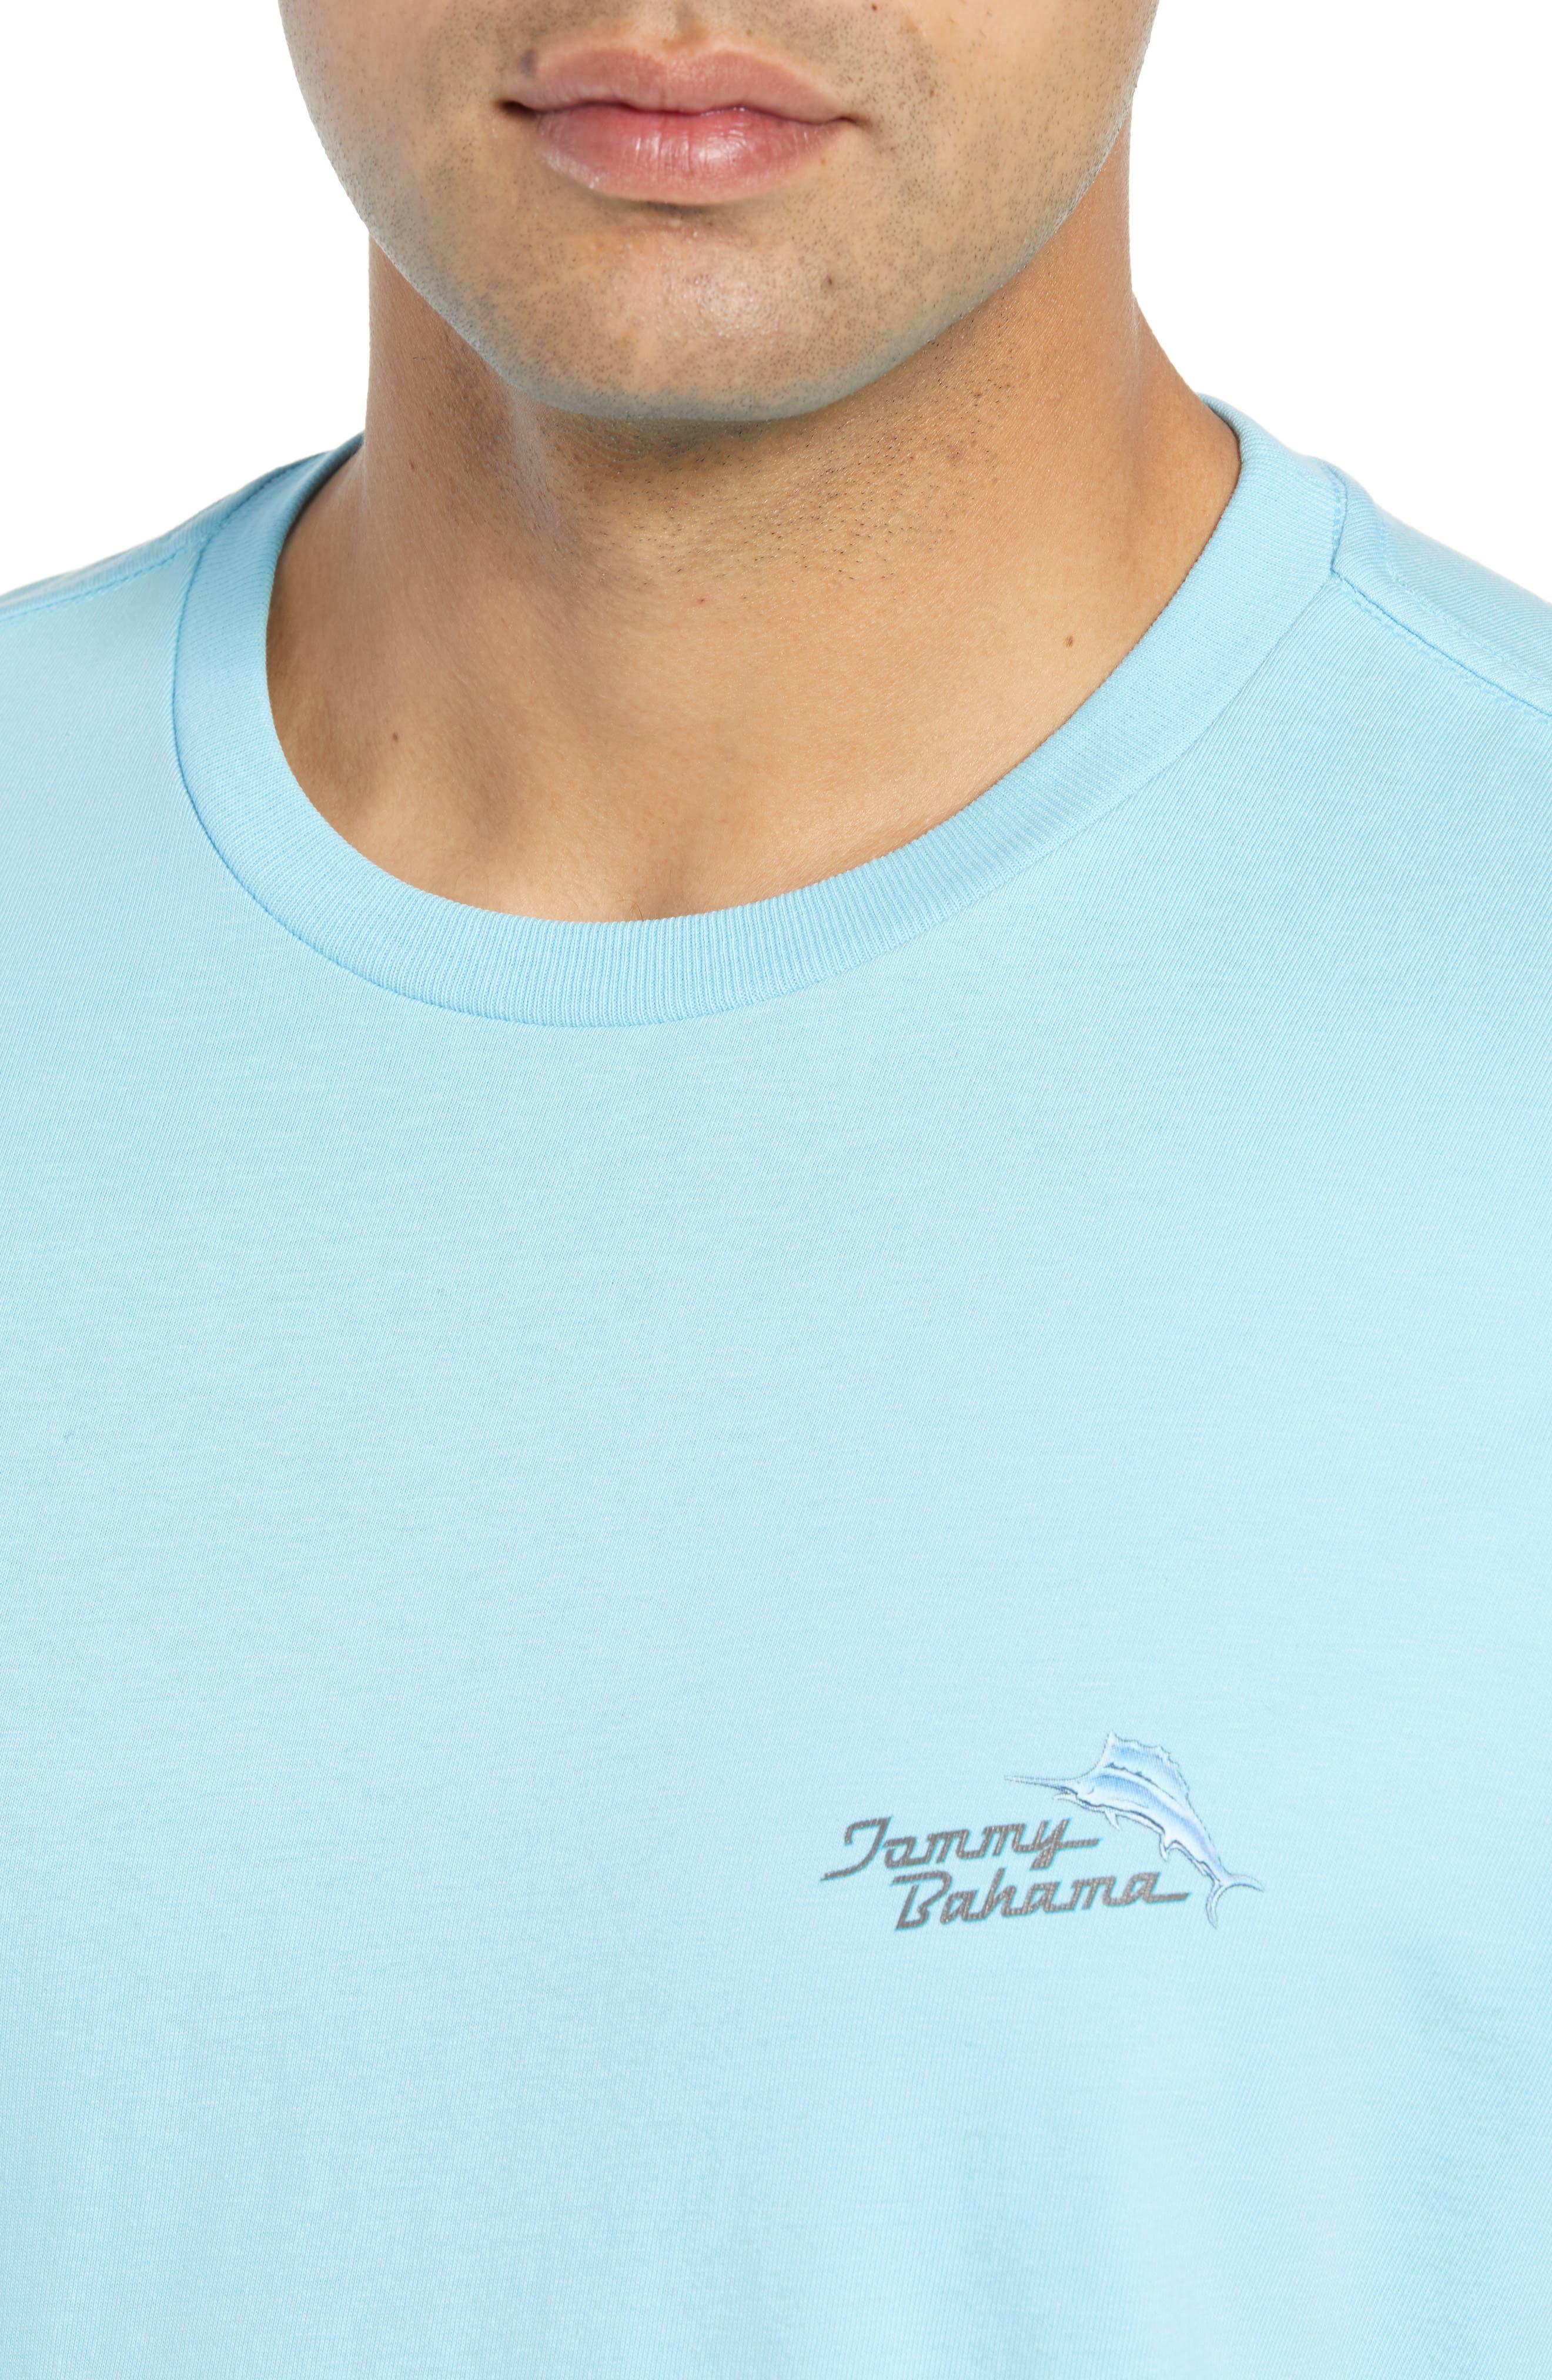 Beach Grille T-Shirt,                             Alternate thumbnail 4, color,                             400